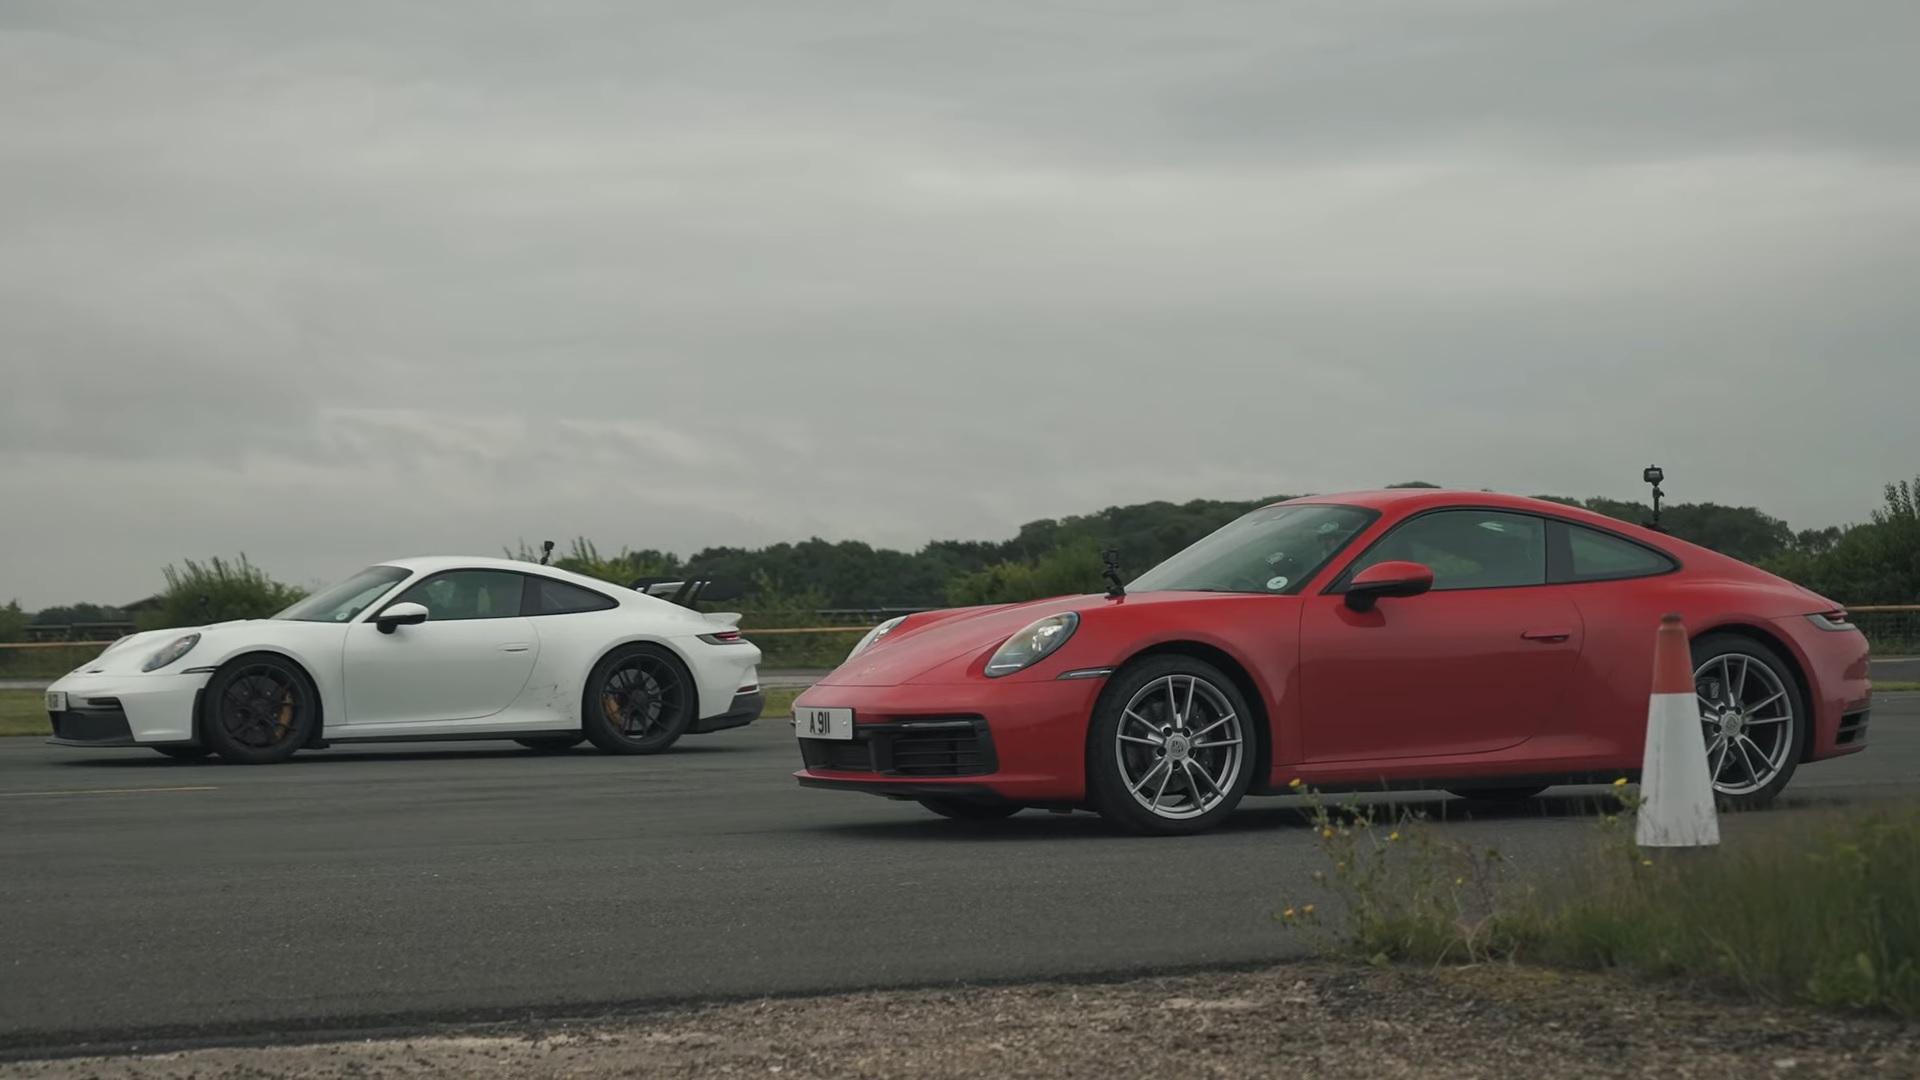 992 Porsche 911 GT3 vs Entry-Level Carrera Drag Race Isn't Even Close